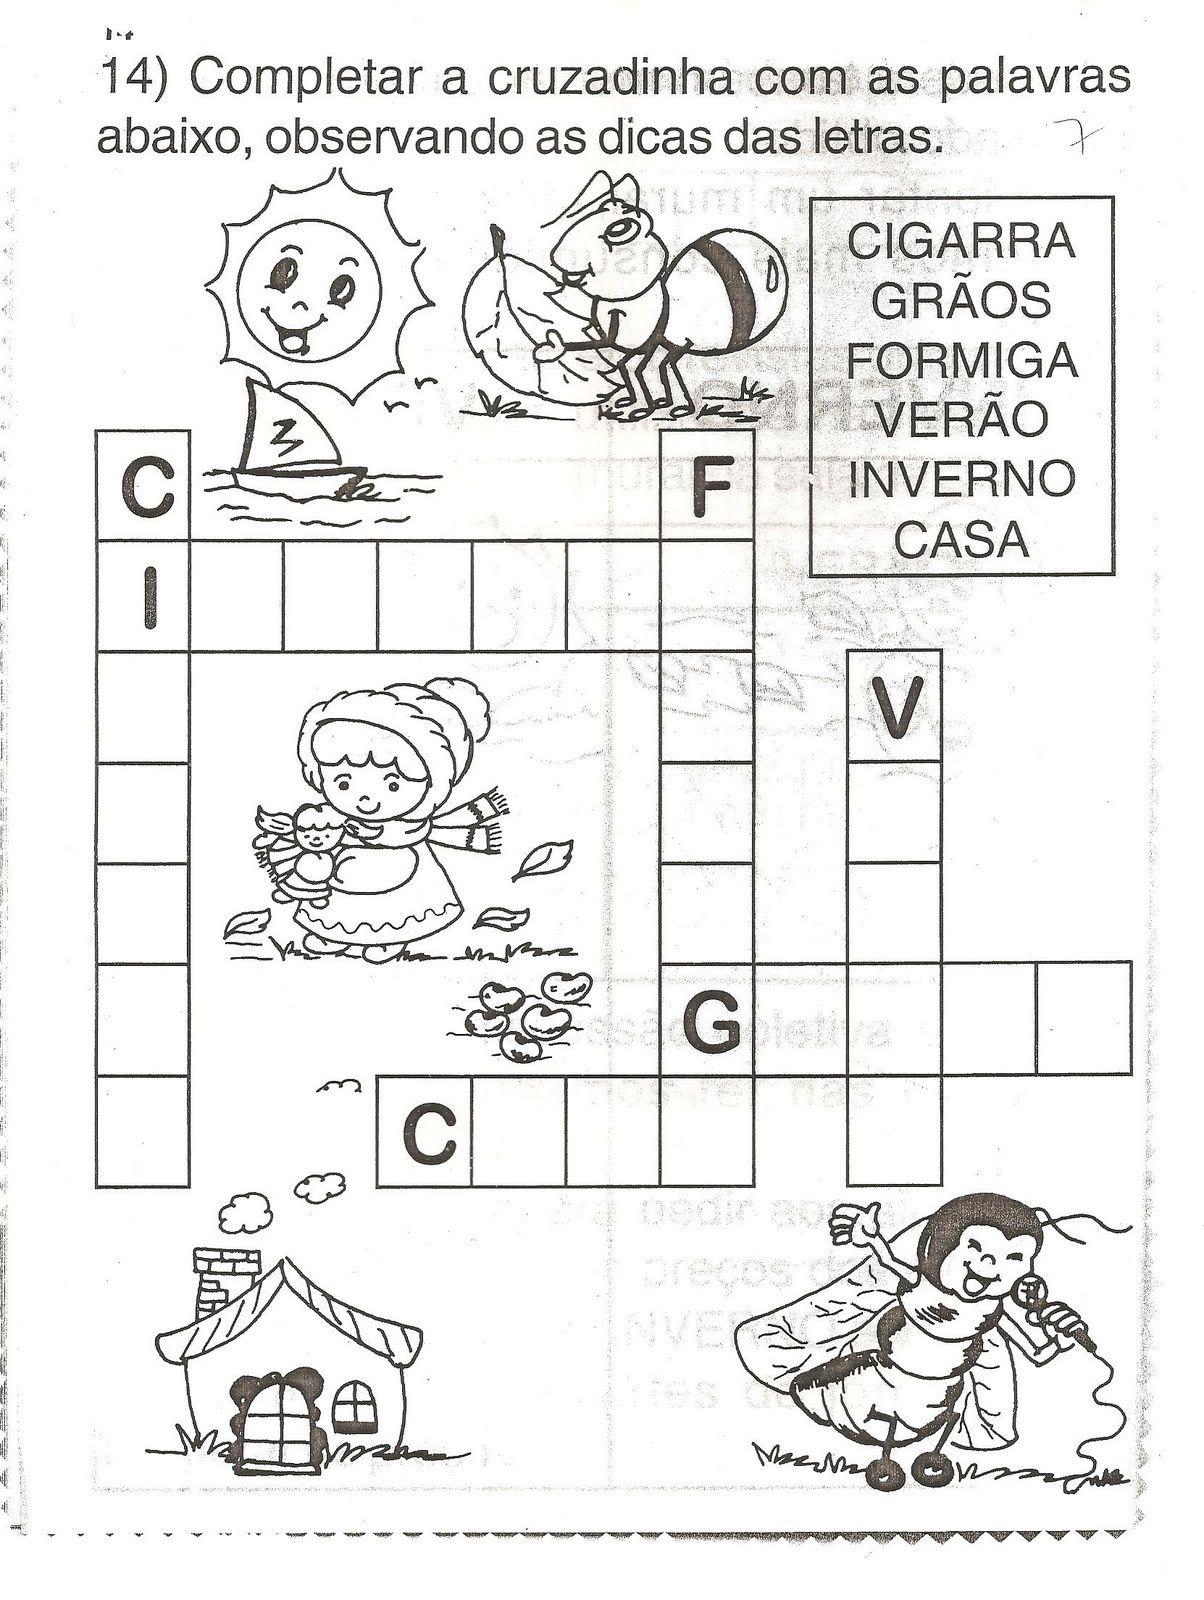 A Cigarra E A Form 006 1